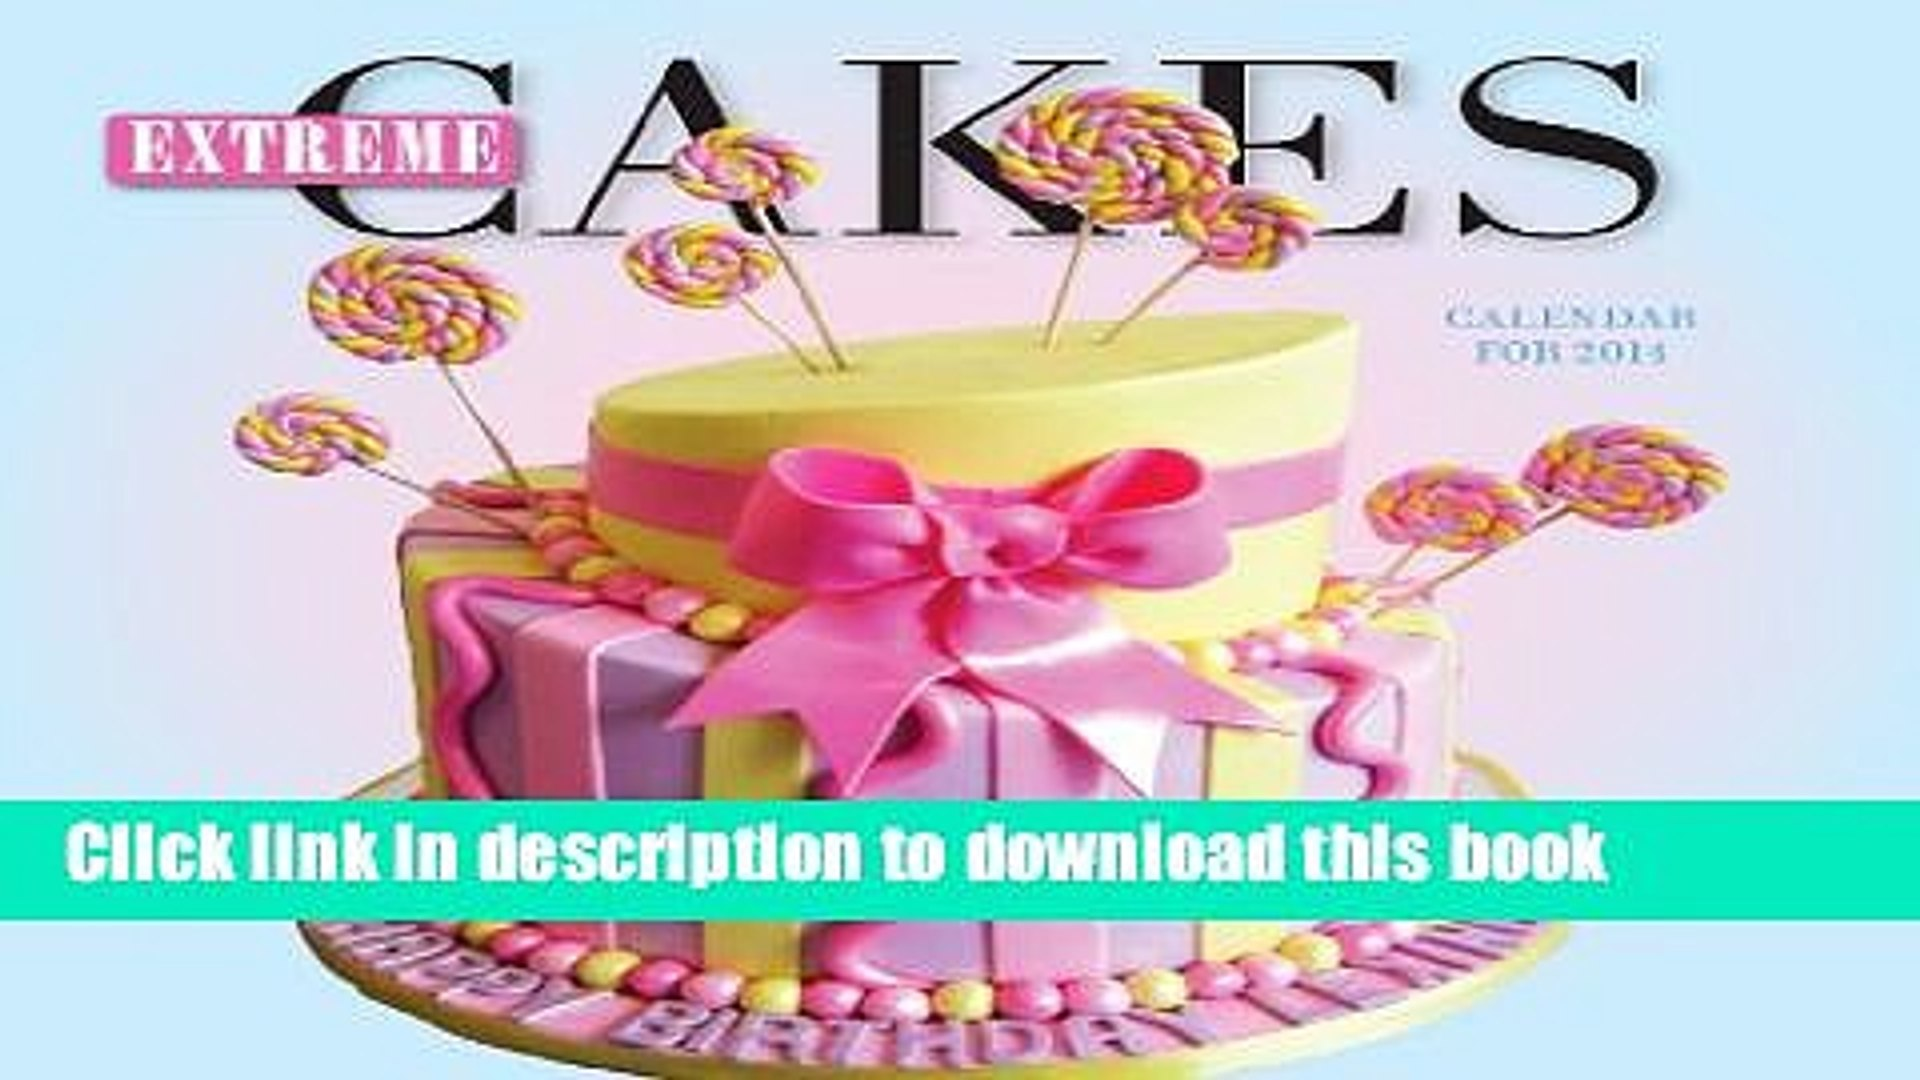 Groovy Ebook Extreme Cakes Mini Calendar 2014 Free Online Video Dailymotion Personalised Birthday Cards Petedlily Jamesorg